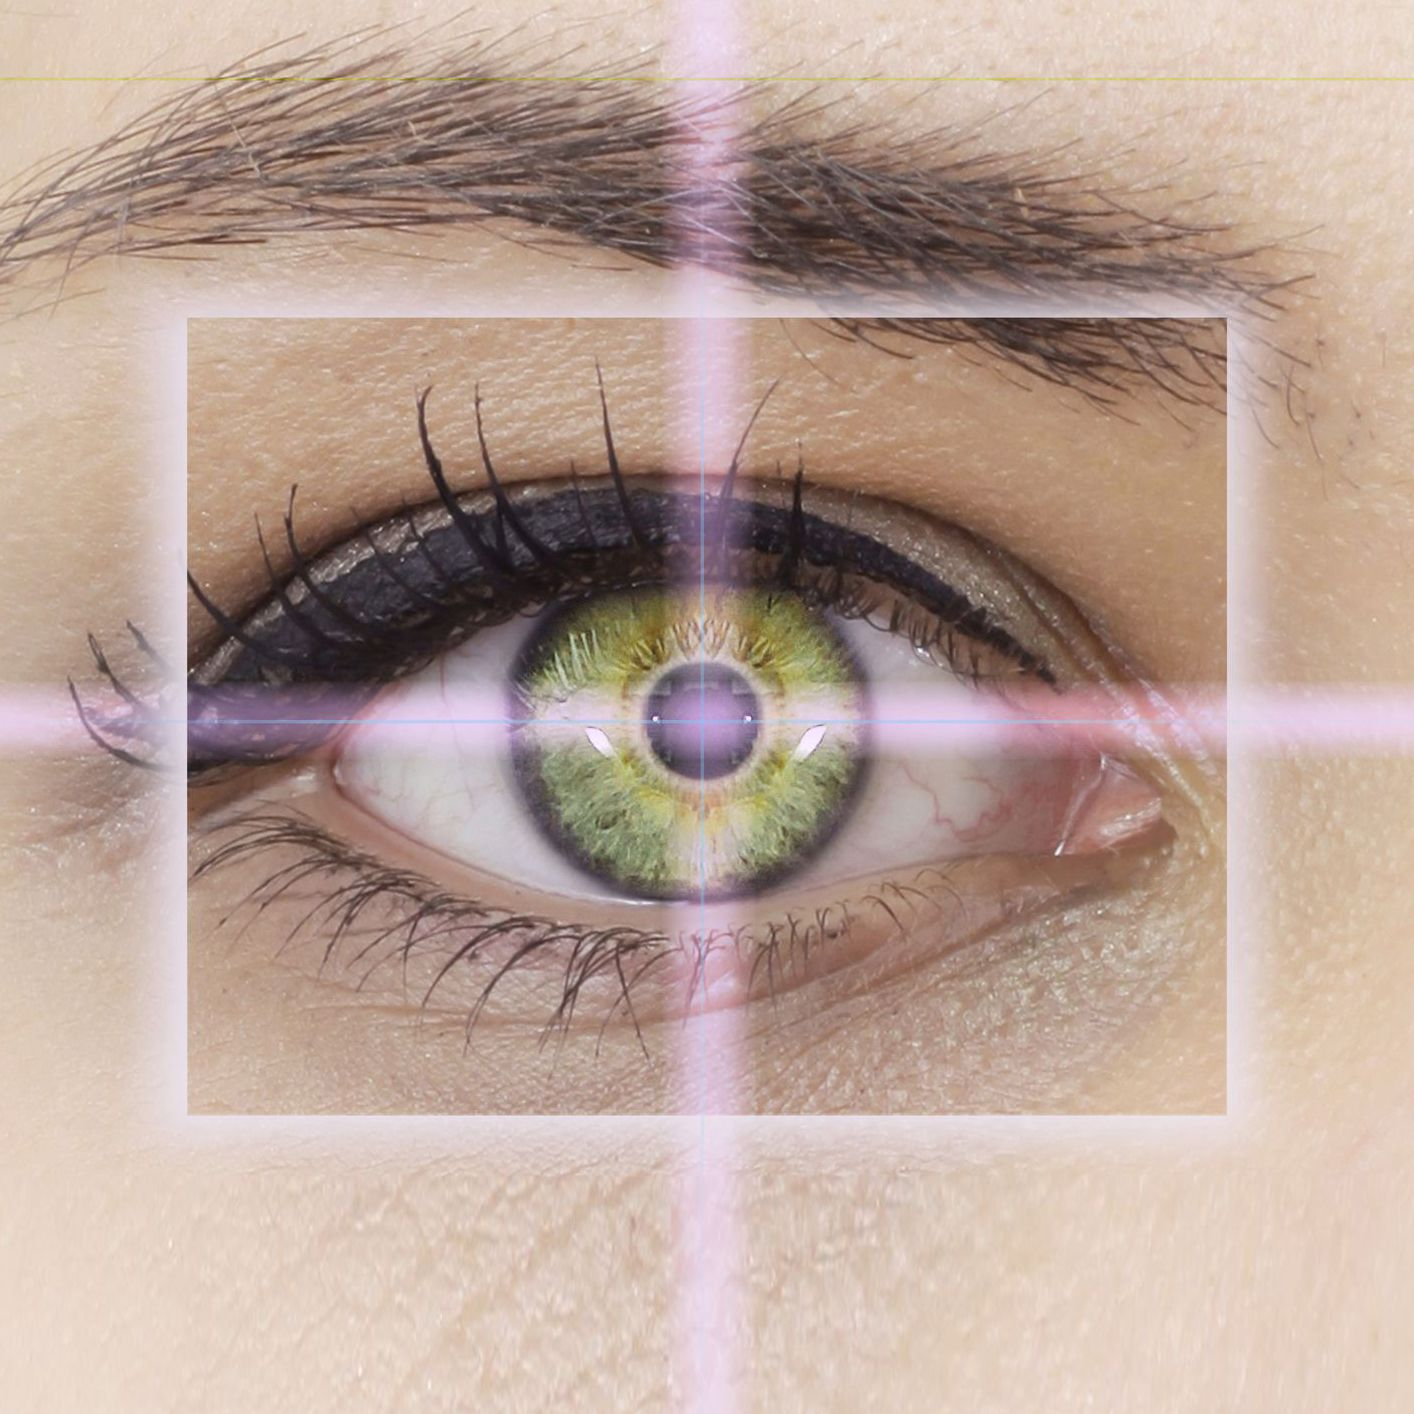 A eye undergoing laser vision correction